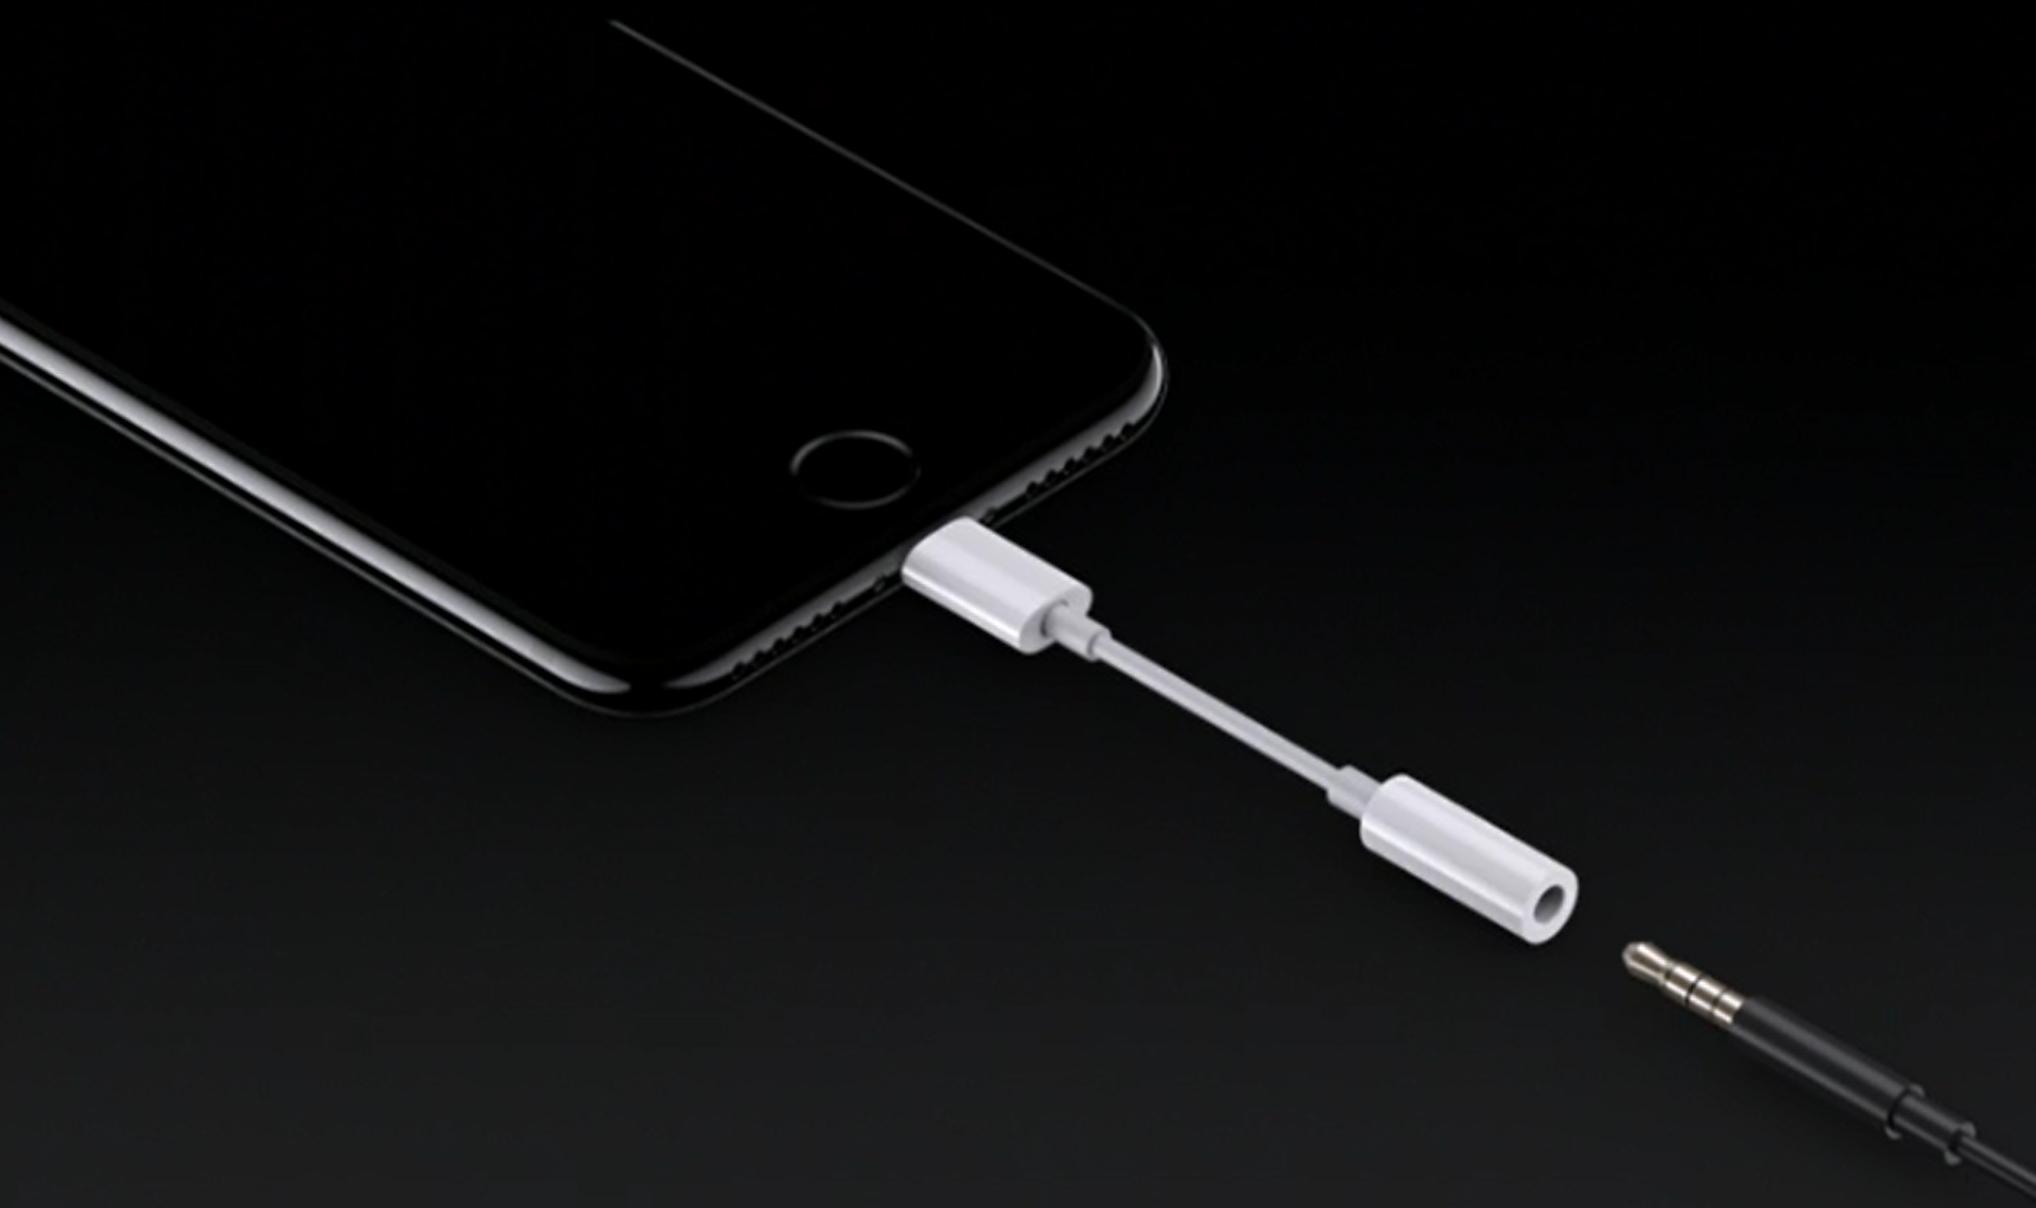 iphone 7 jack lightning